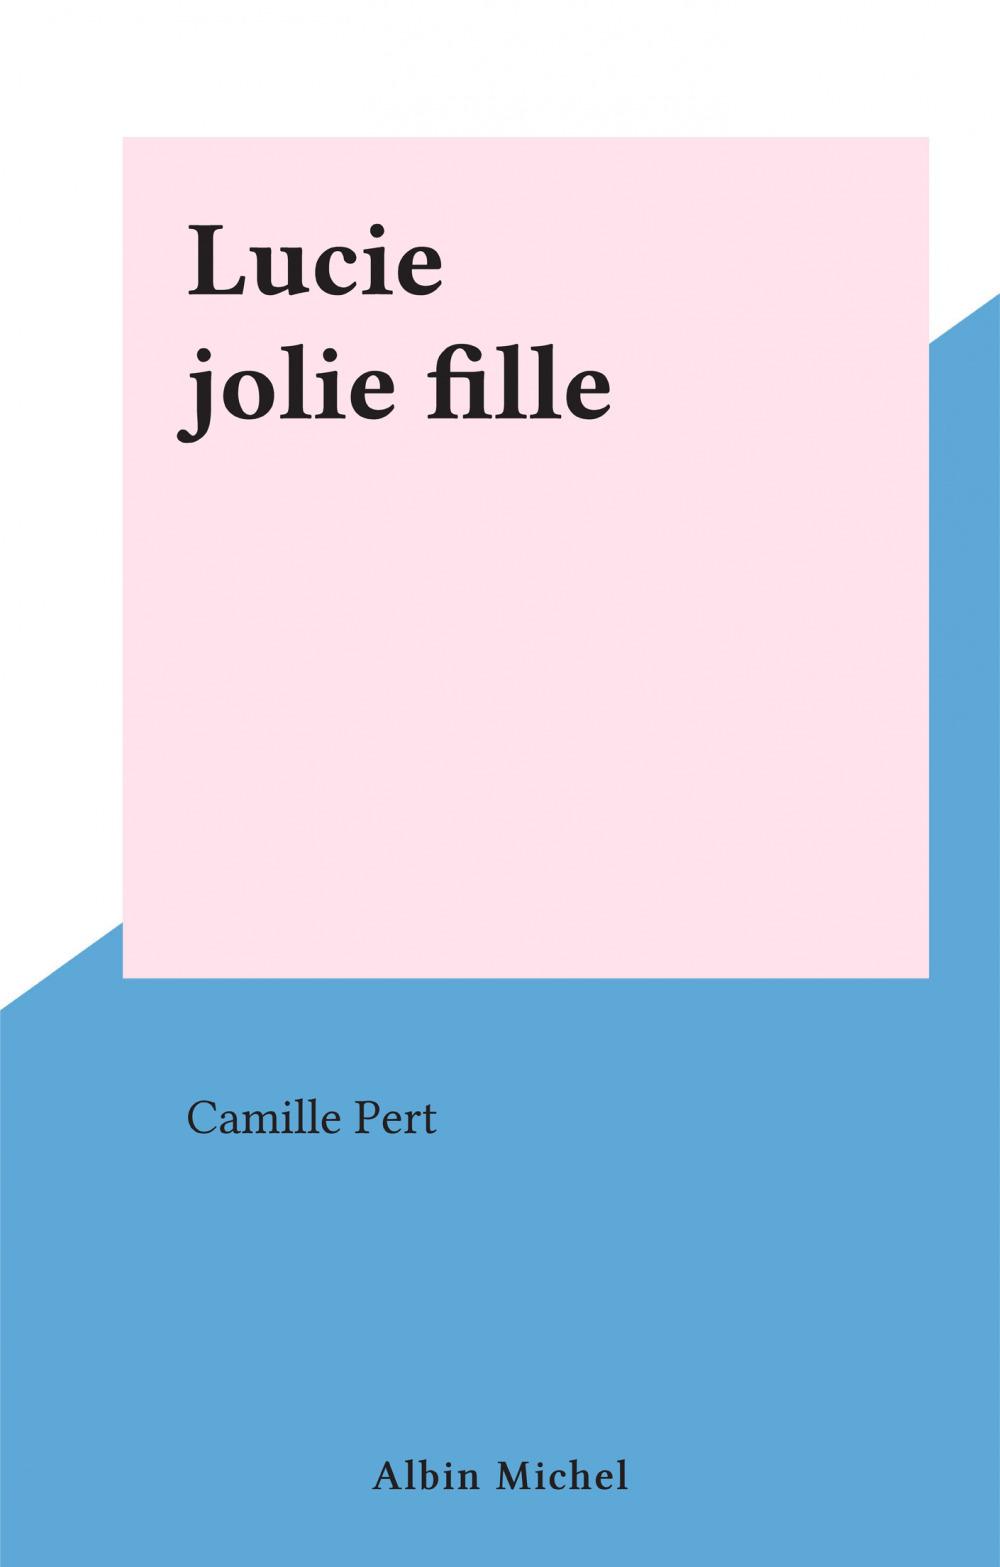 Lucie jolie fille  - Camille Pert